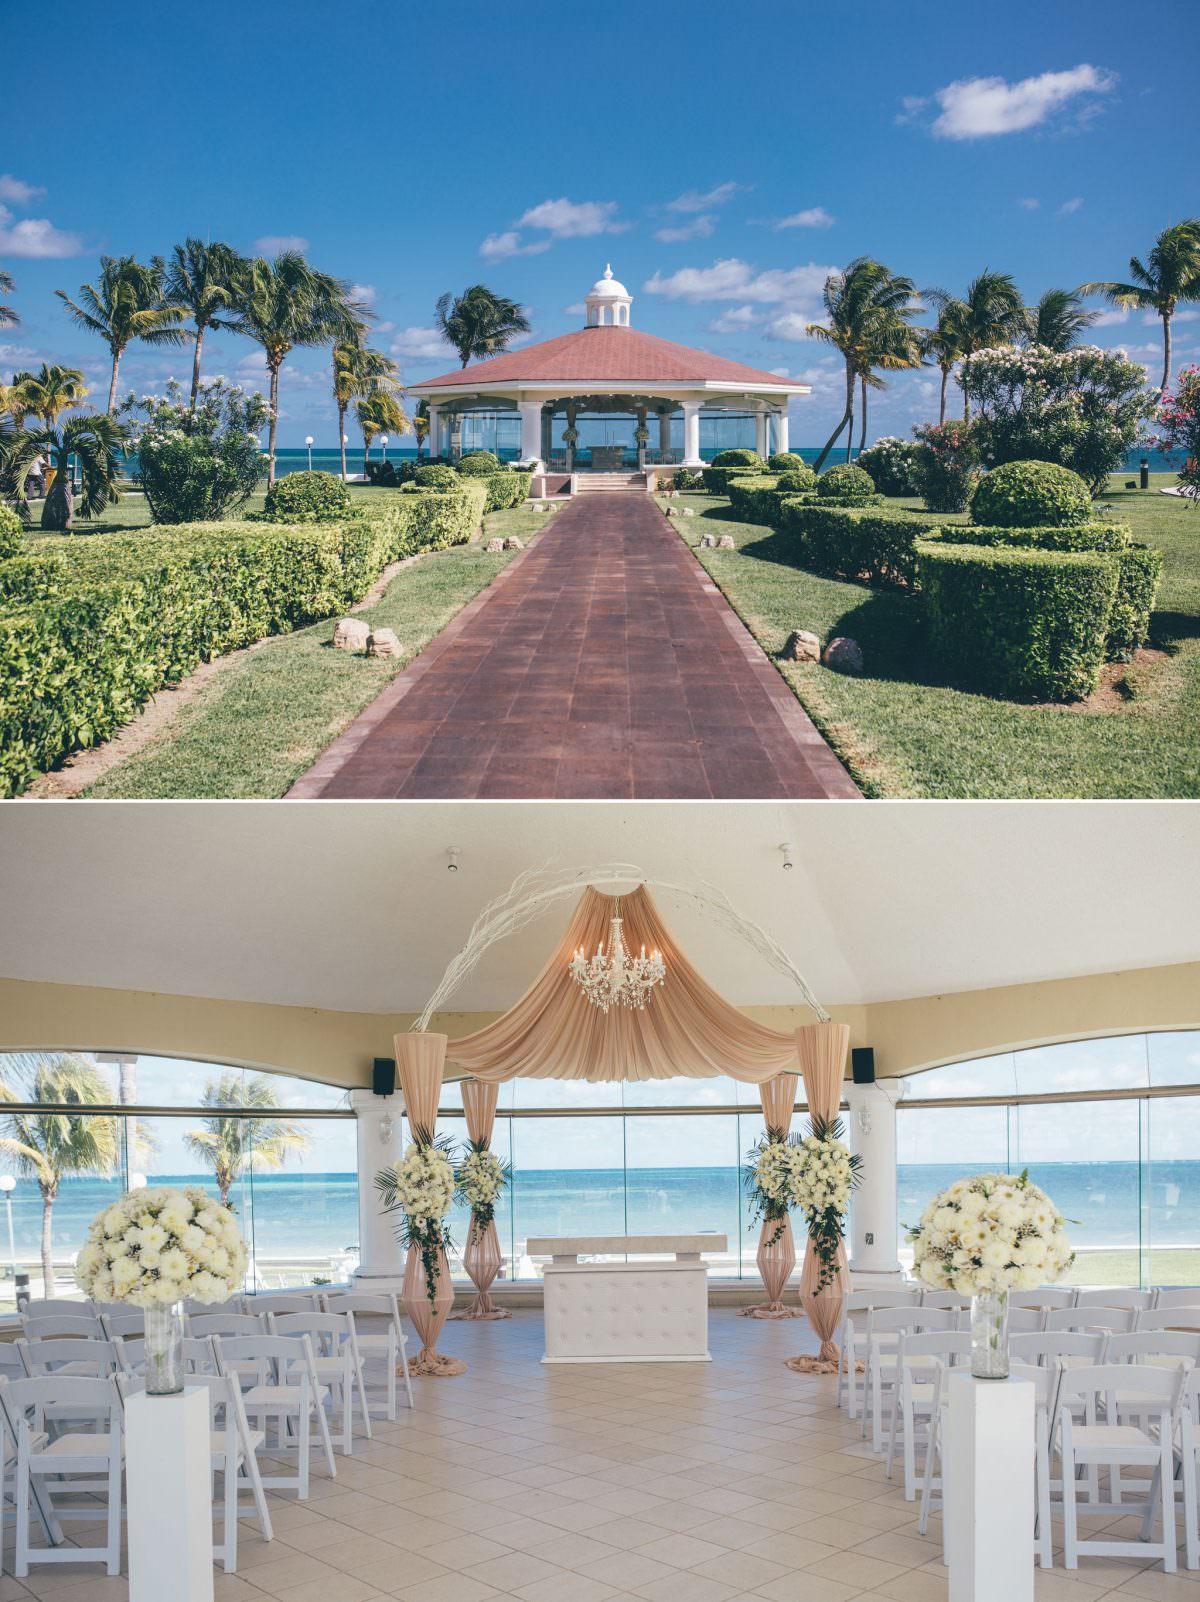 destination_wedding_photographer_cancun_mexico_rachel_lambert_photography_alanna_chris_ 6